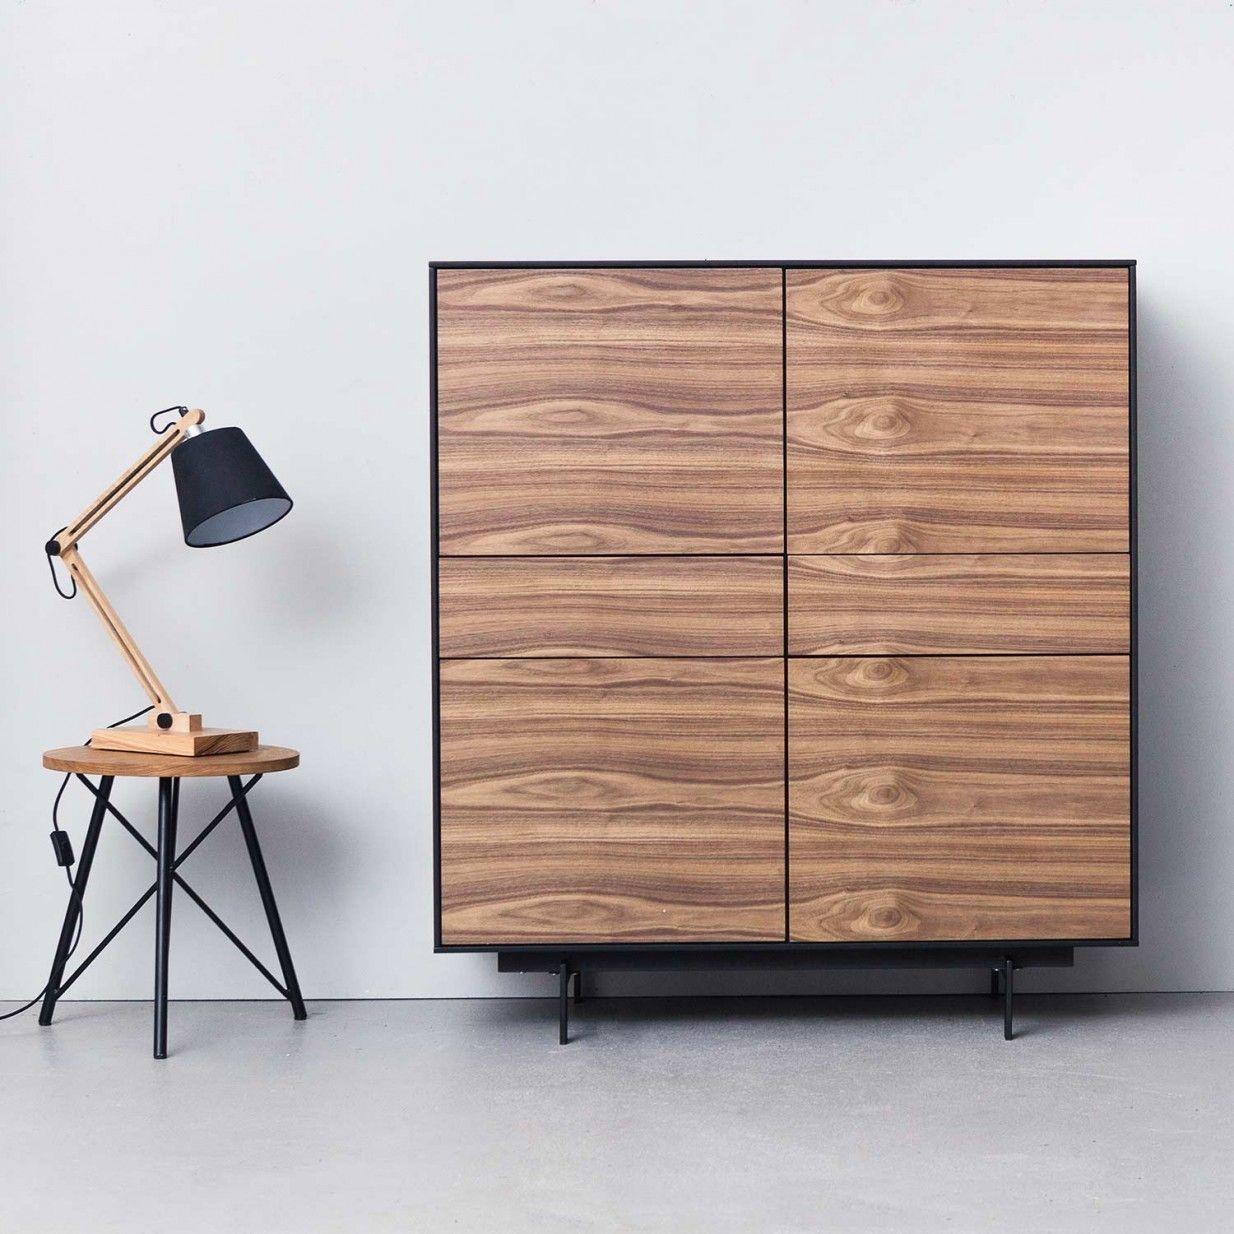 Siviglia Kommode Unico Milano Ideeen Voor Thuisdecoratie